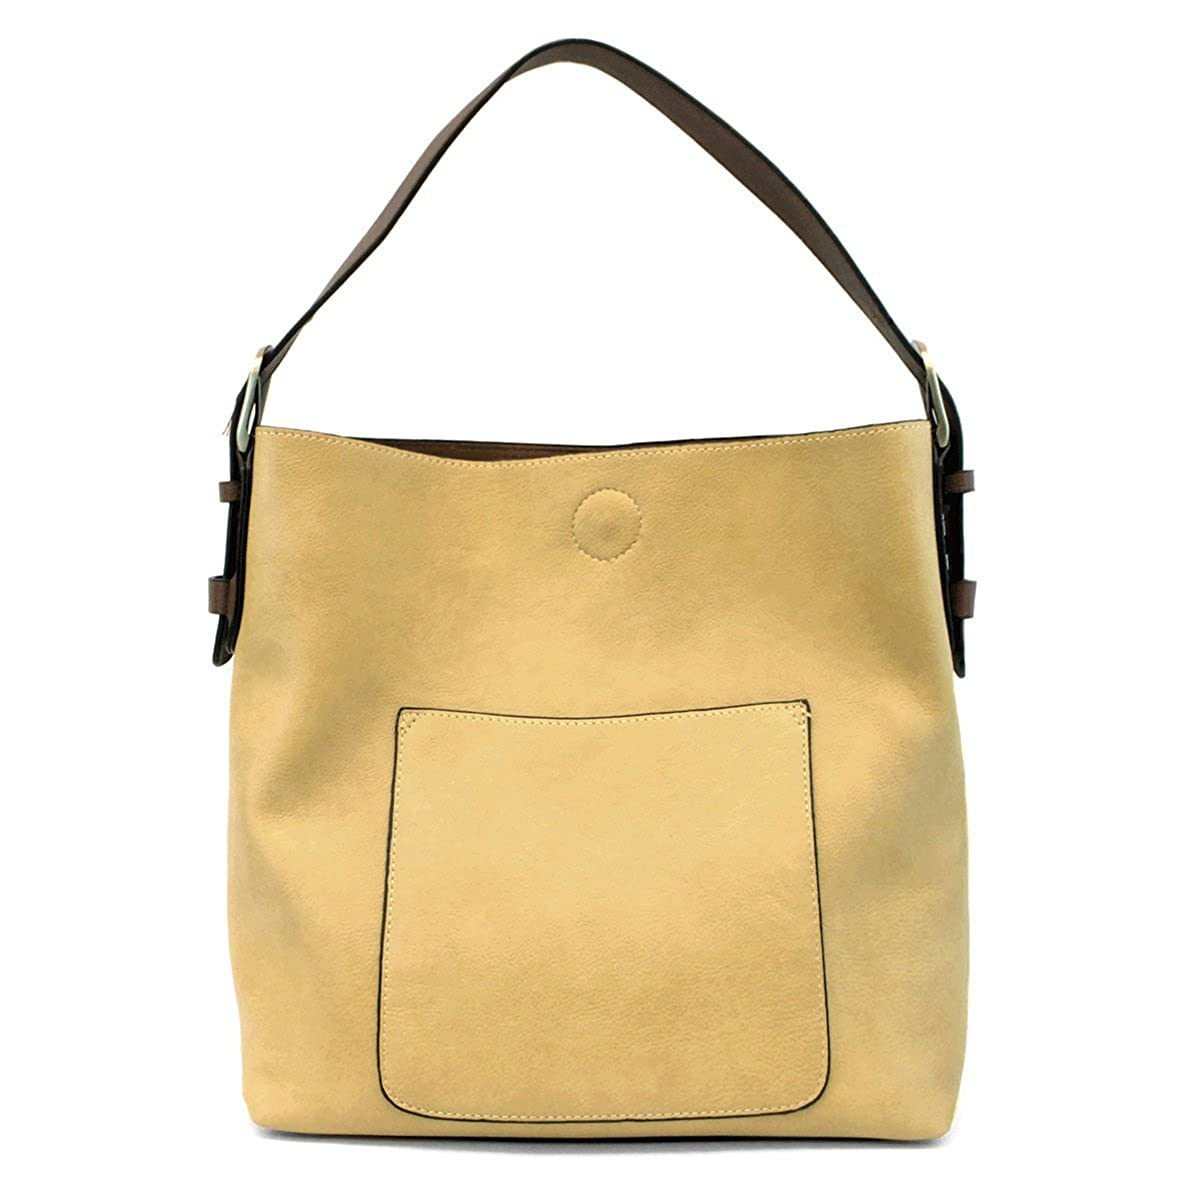 Celedon Joy Susan Classic Hobo Handbag